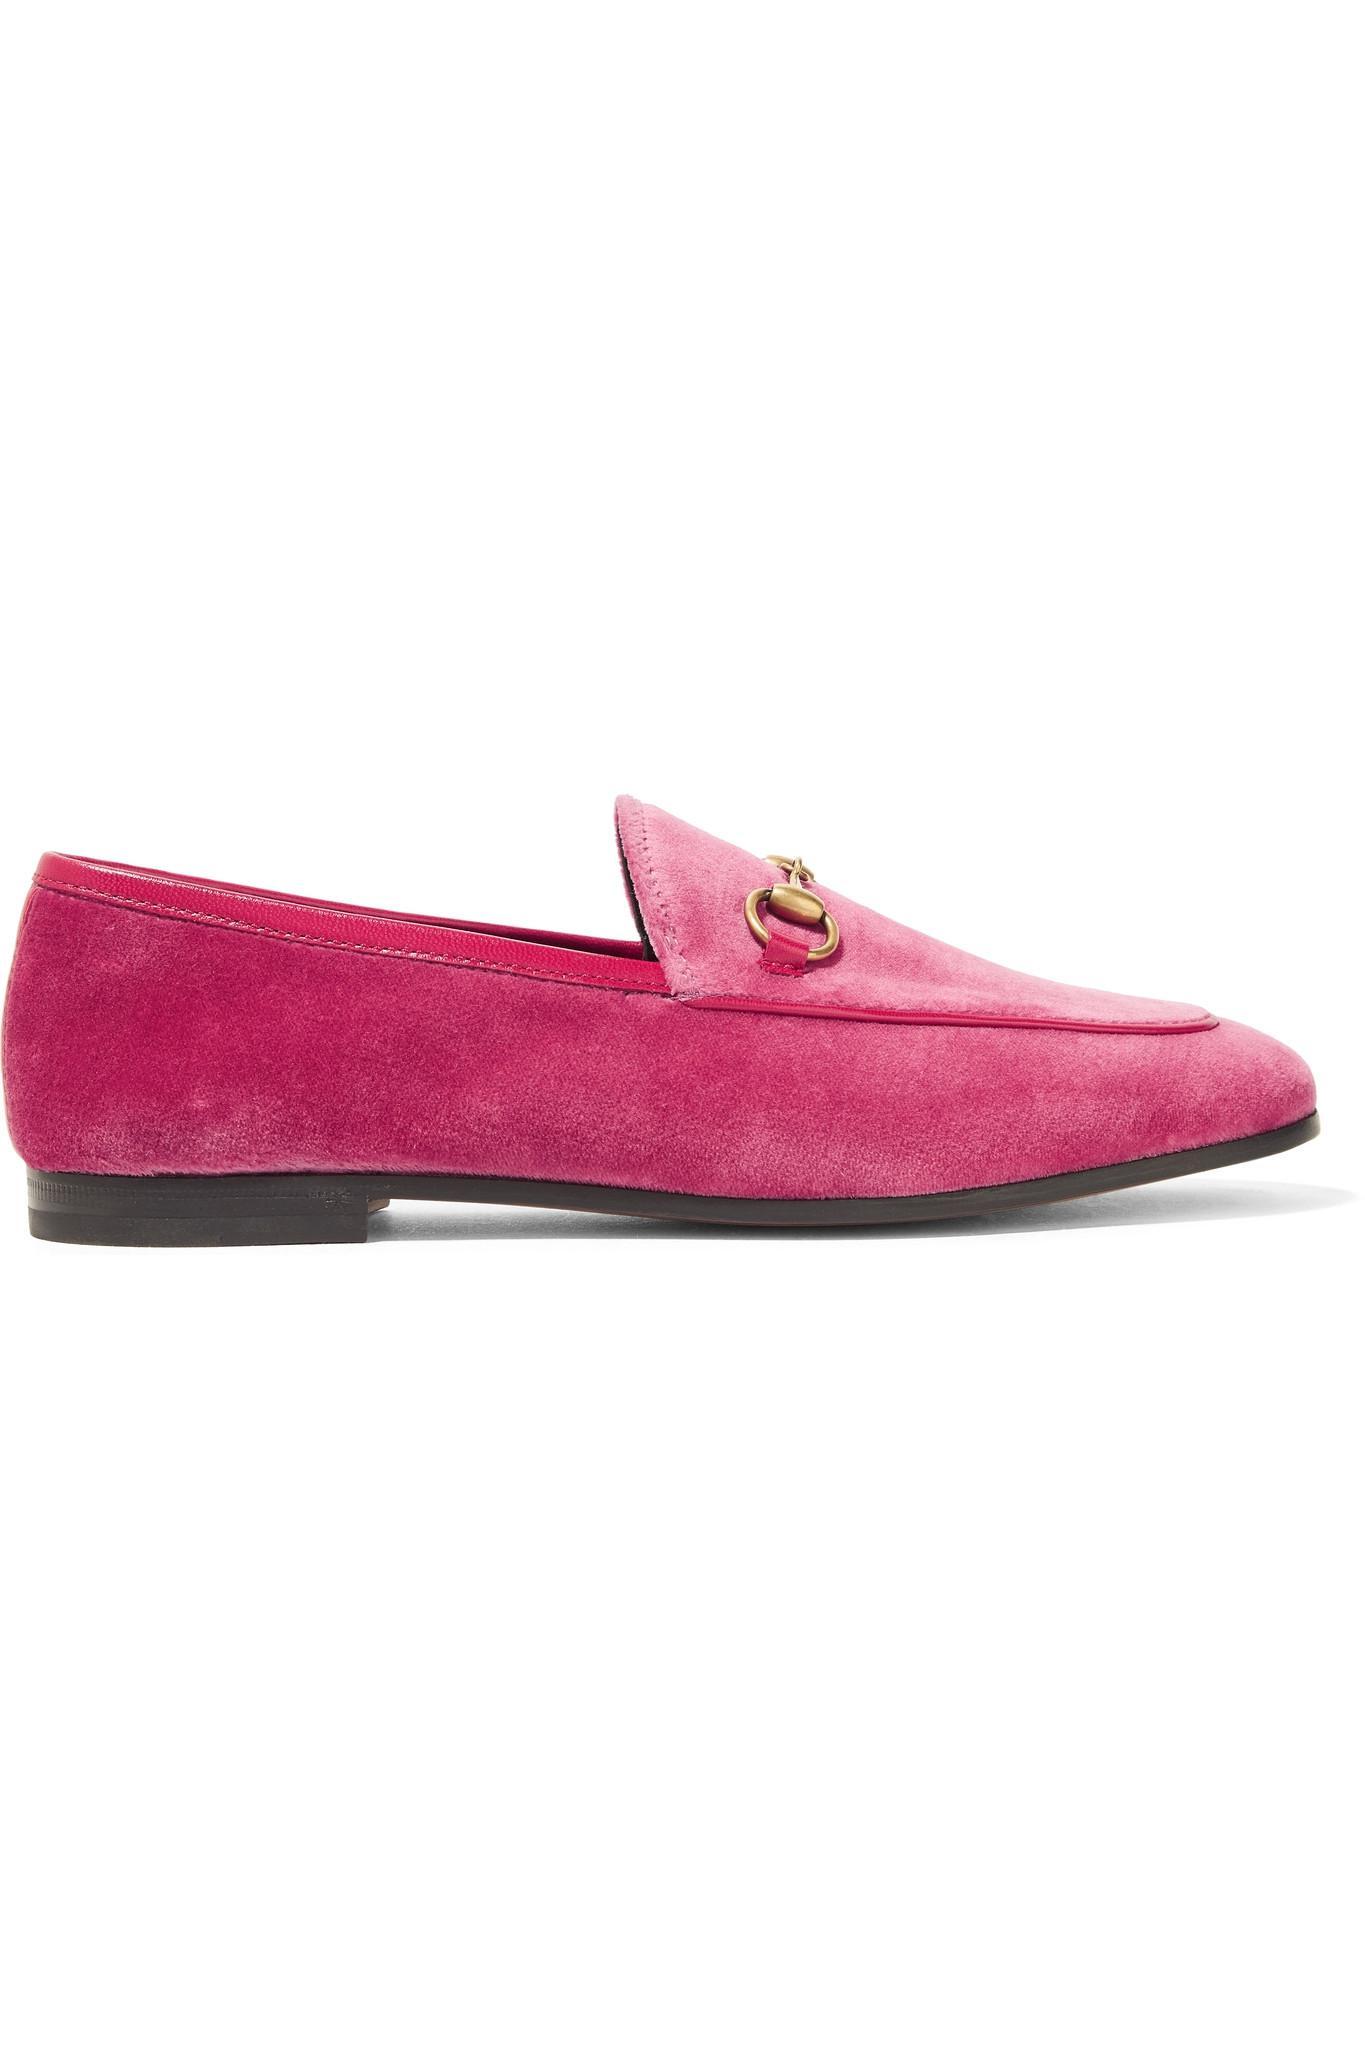 7cf3ba4ad6e Gucci Jordaan Horsebit-detailed Leather-trimmed Velvet Loafers in ...